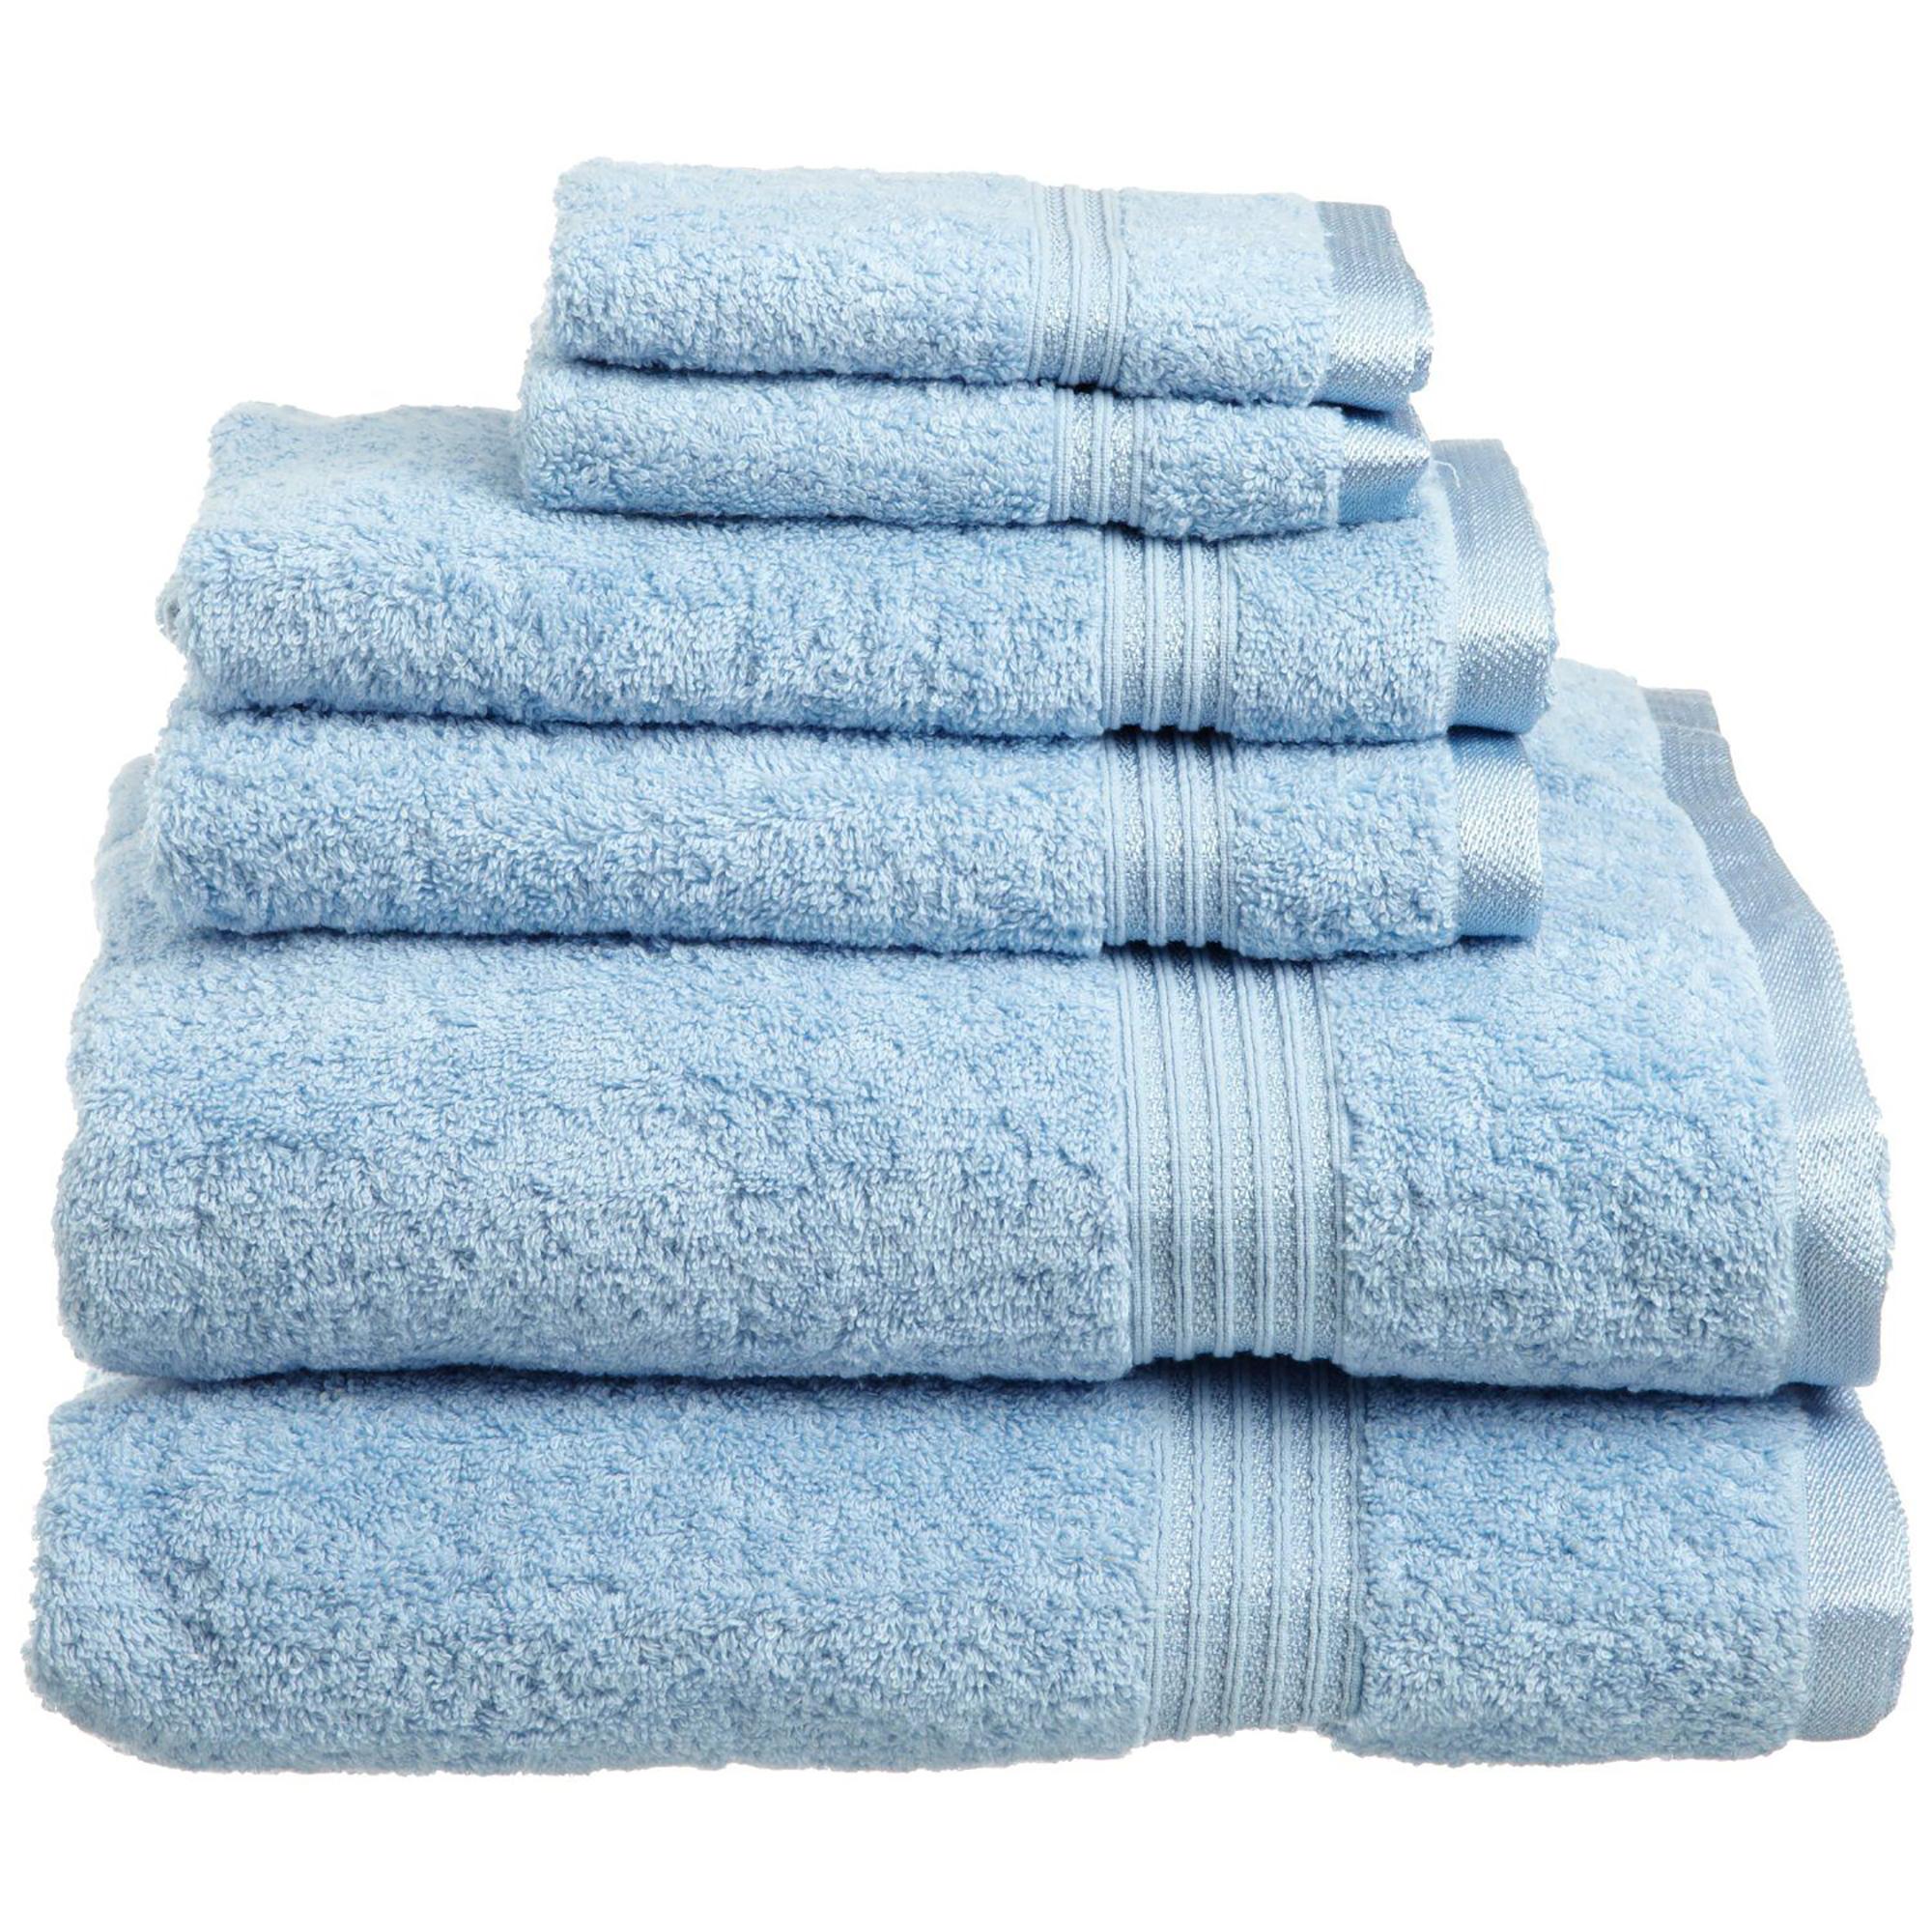 Superior 600GSM Egyptian Quality Cotton 6-Piece Towel Set